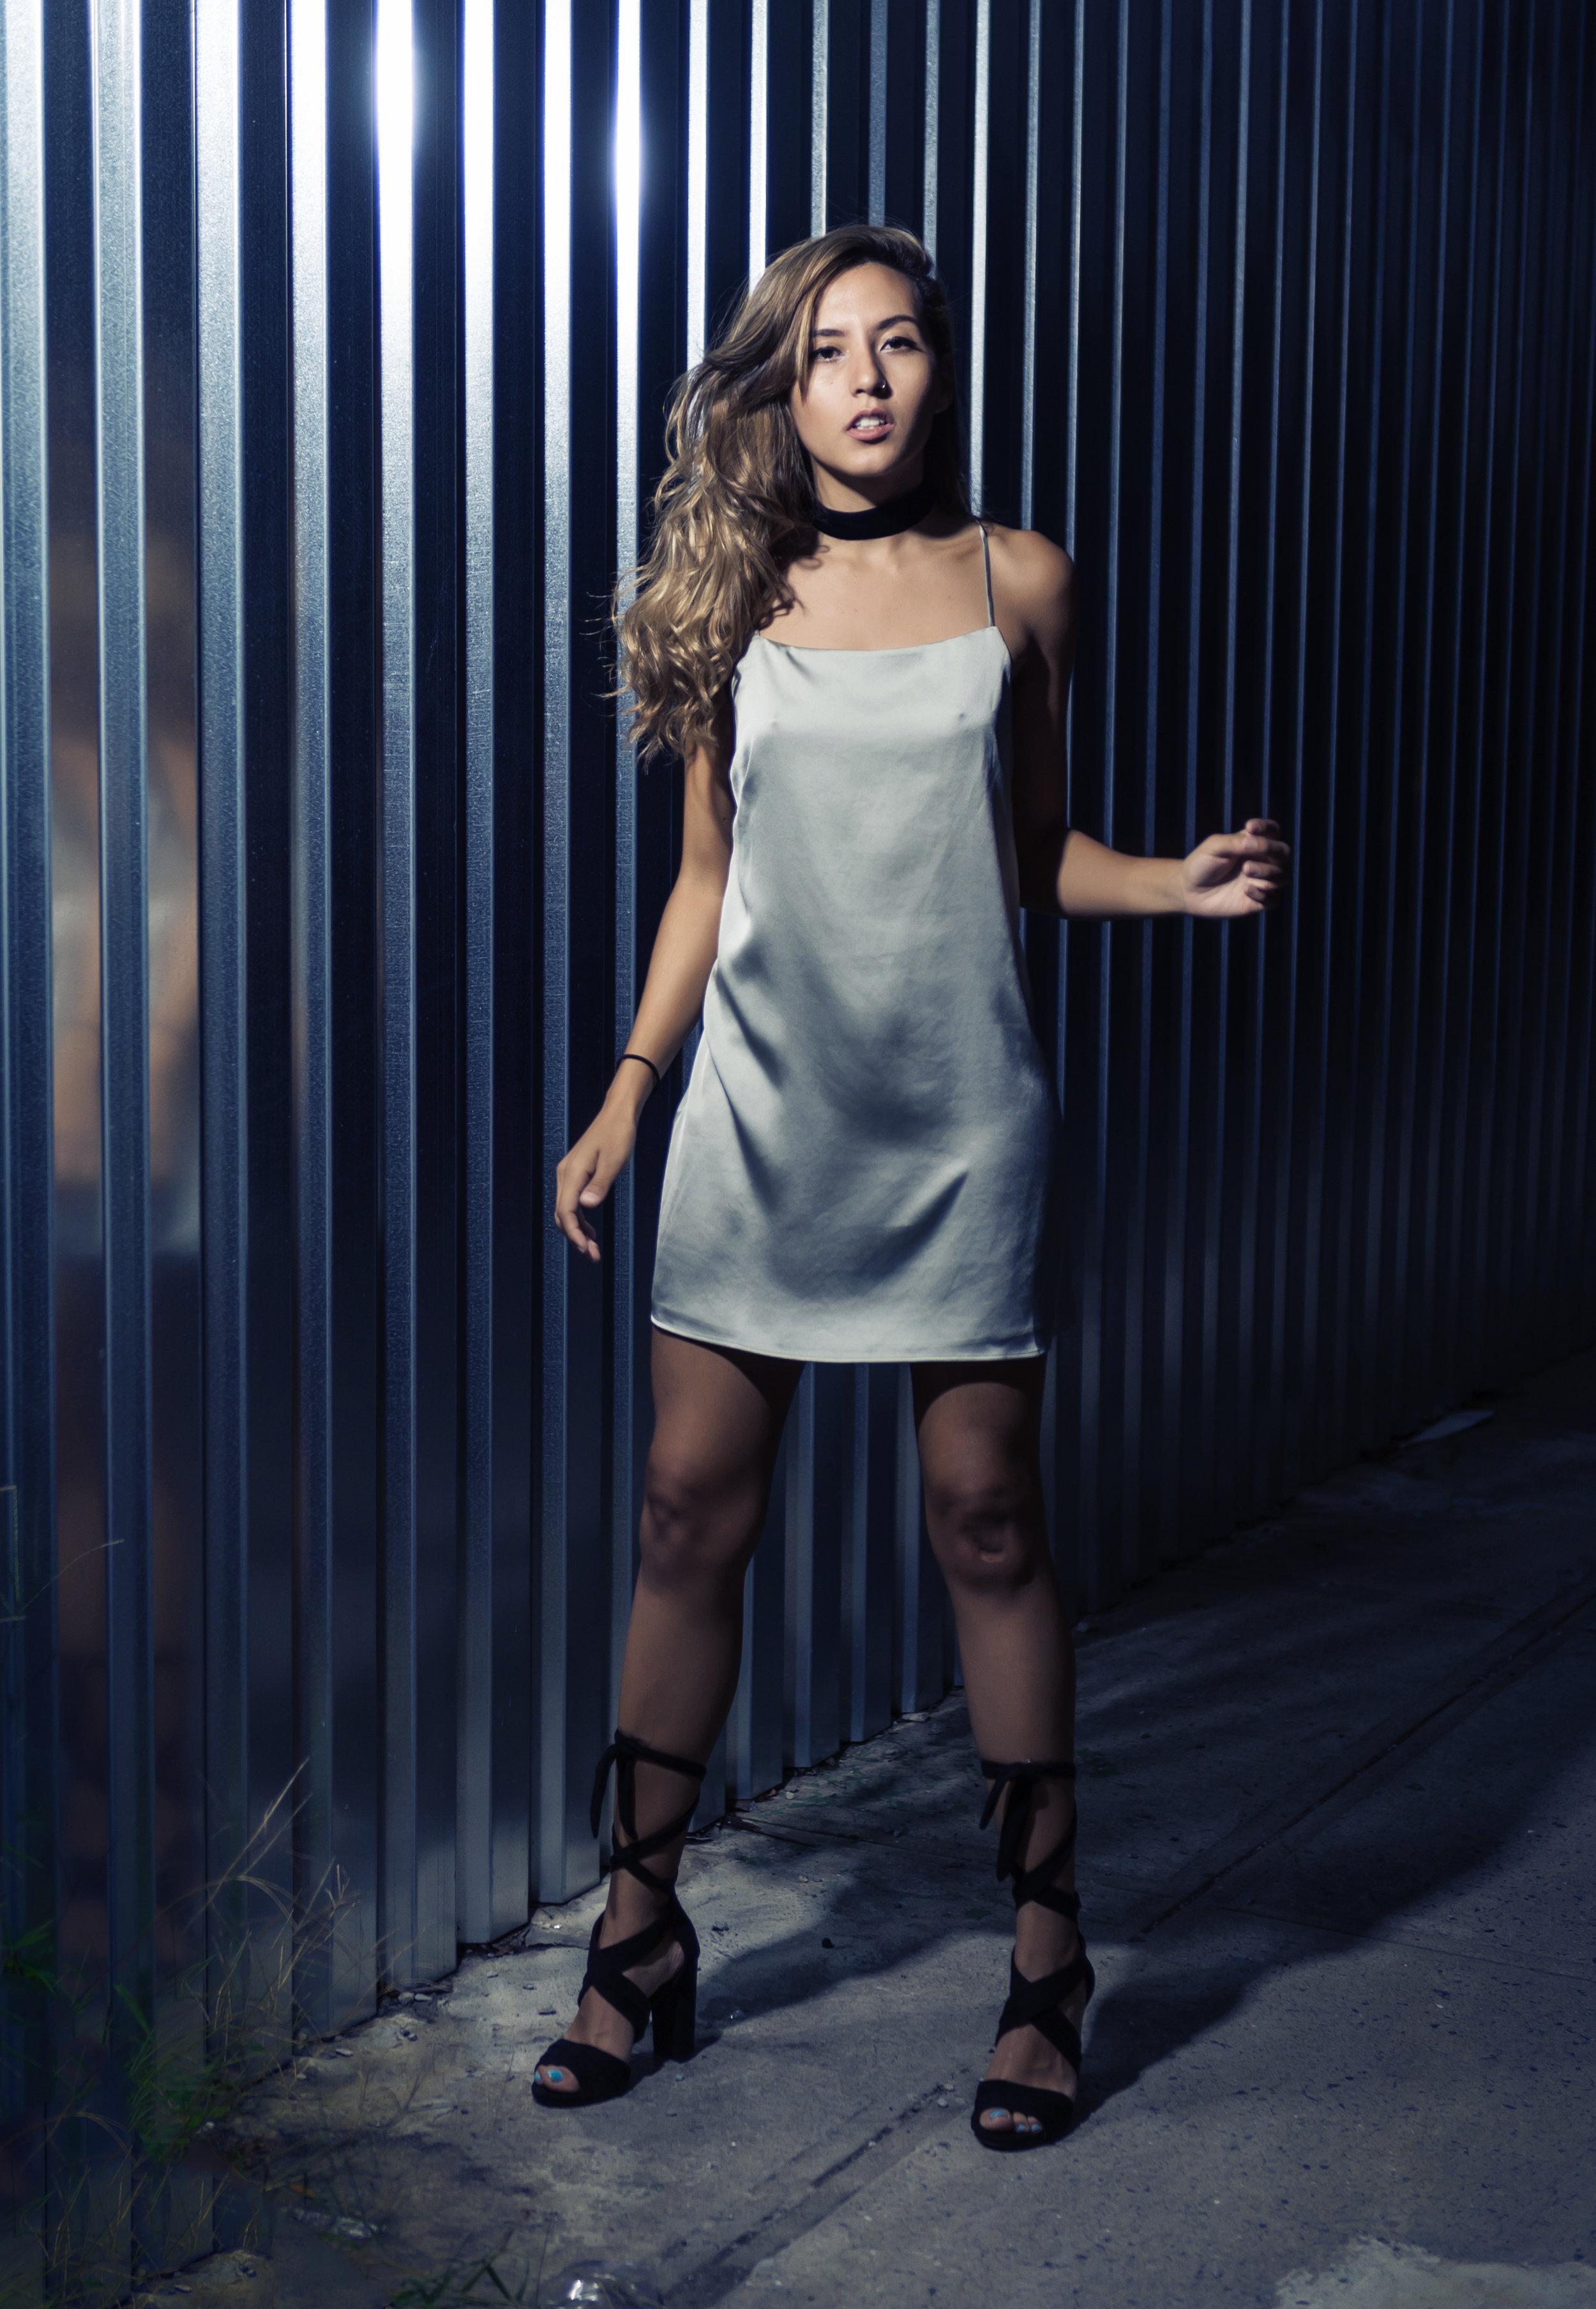 fashion-blogger-raquel-paiva-wears-silver-slip-dress